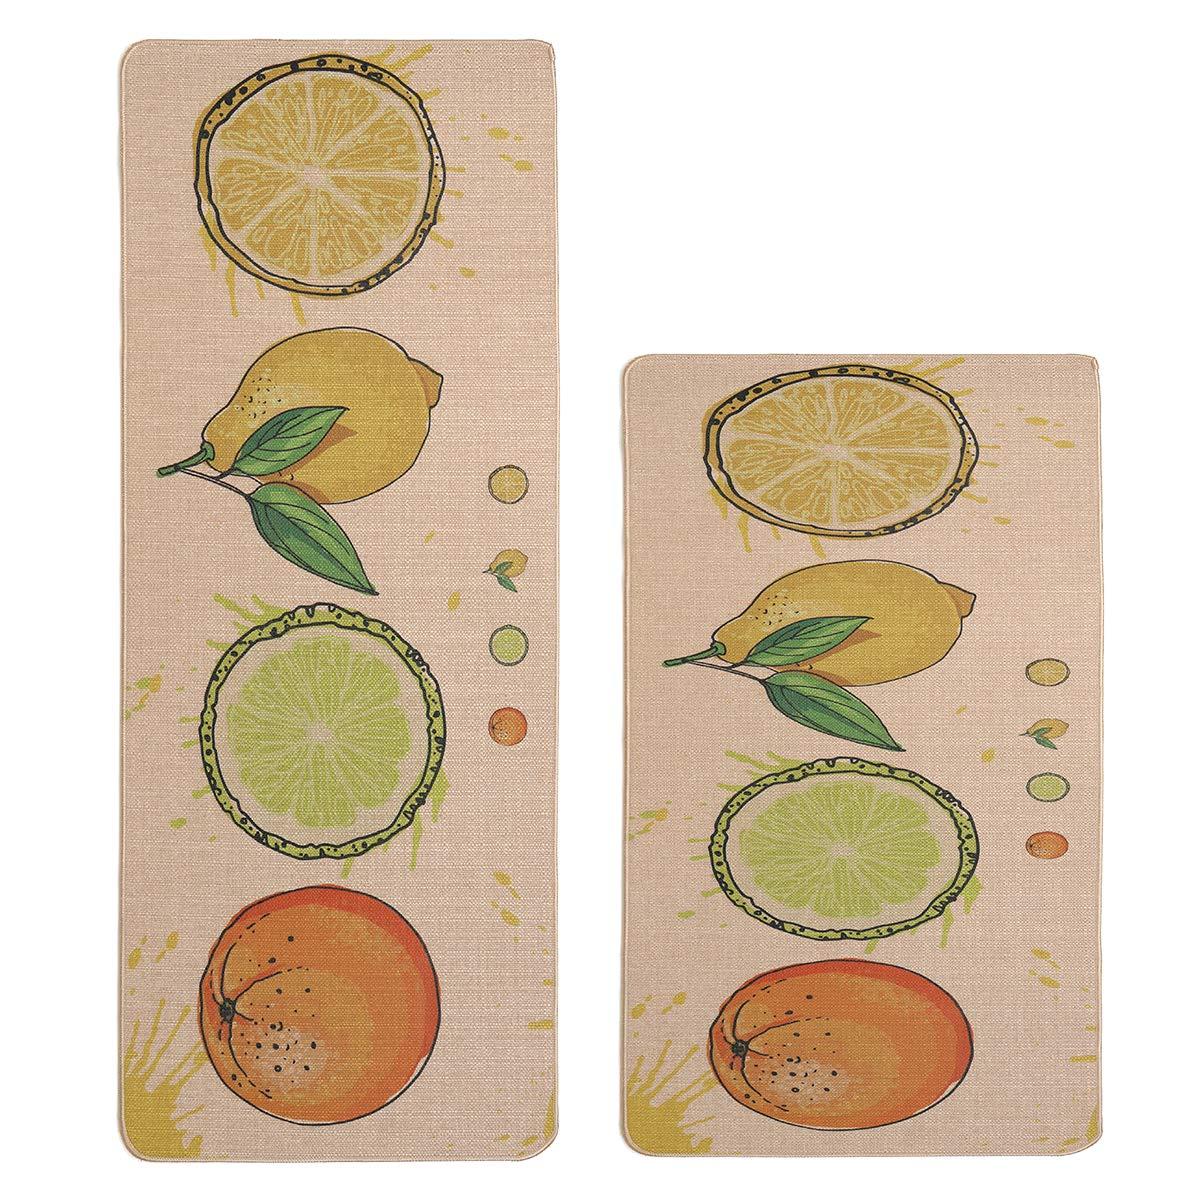 "Kitchen Rugs,LEEVAN 2 PCS Vintage Microfiber Non-Skid/Slip Rubber Back Washable Doormat Floormat Area Rug Carpet (17"" X 29""+17"" X 59"", Fruits)"